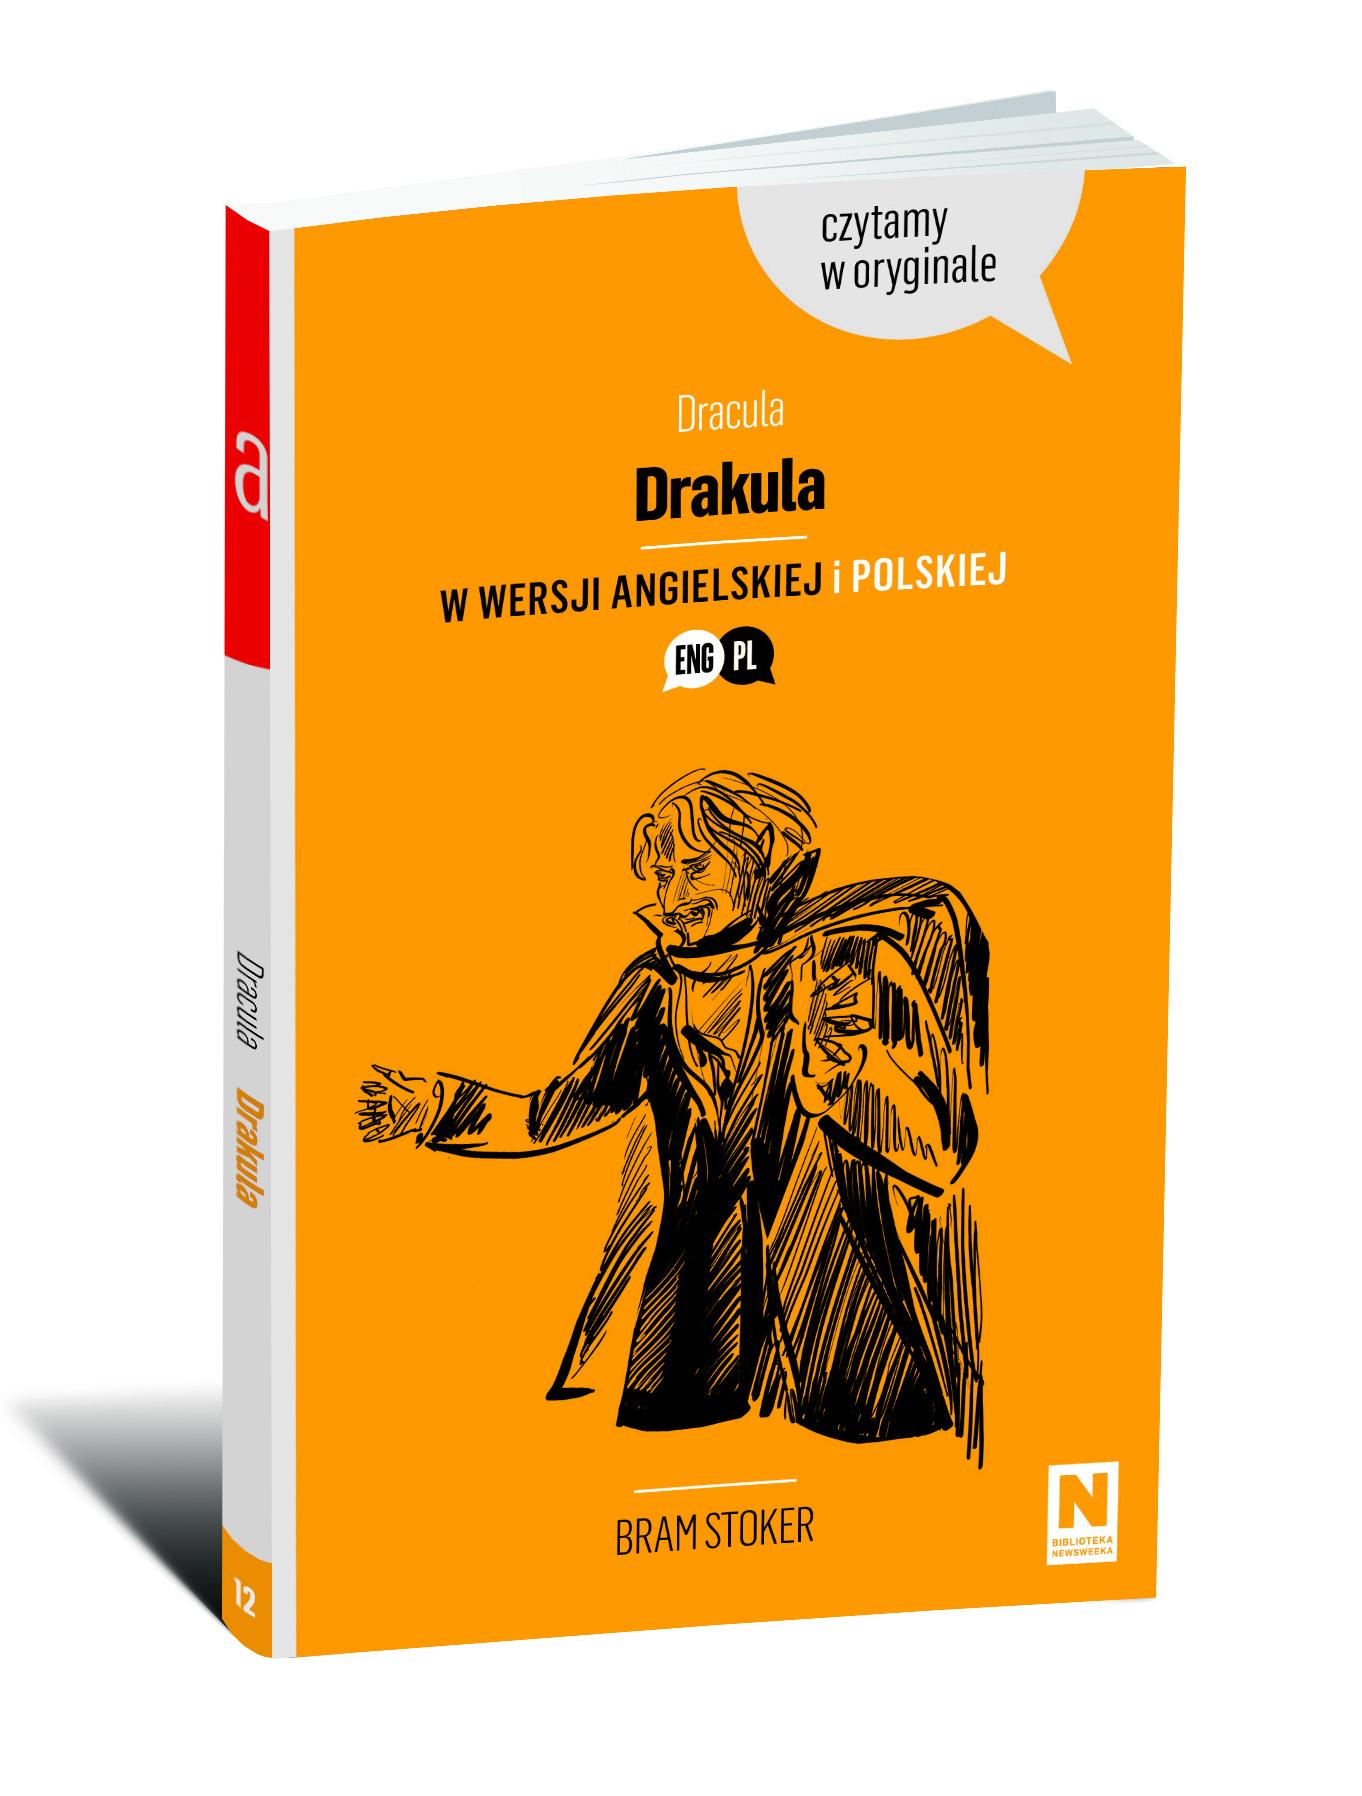 12. Drakula - 3D